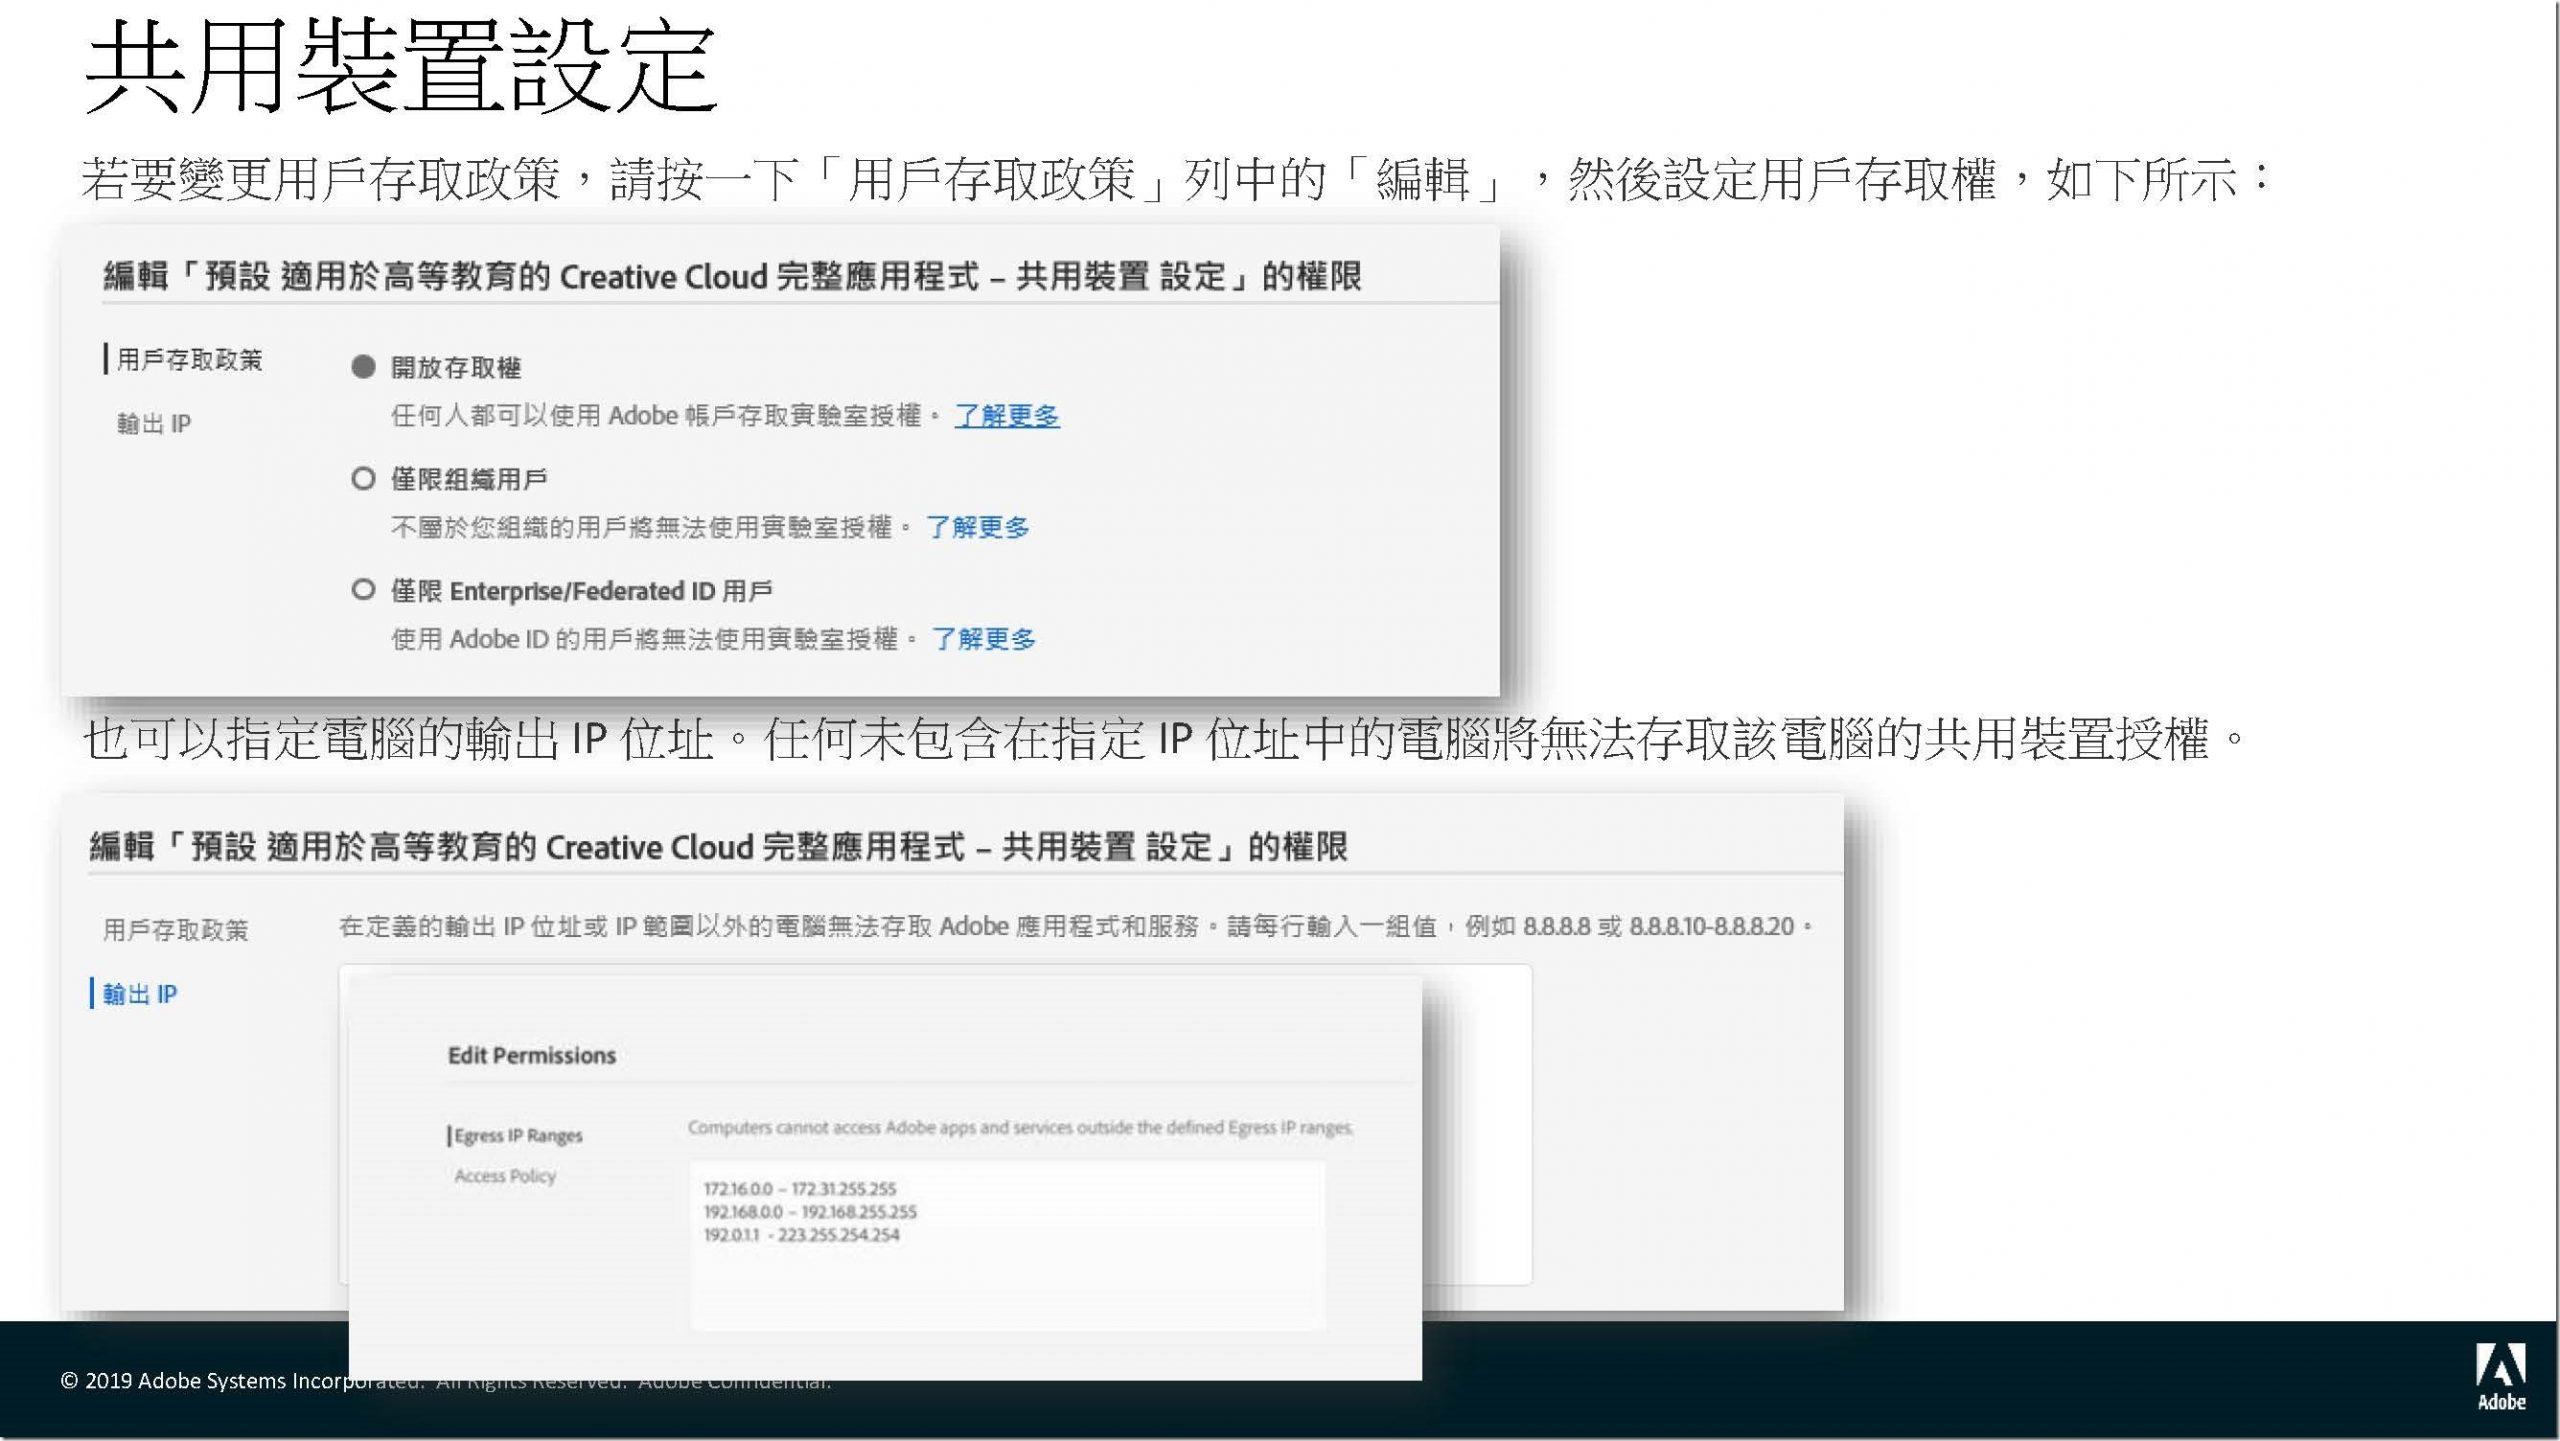 Adobe 共用裝置授權安裝指南_教育通用_頁面_27